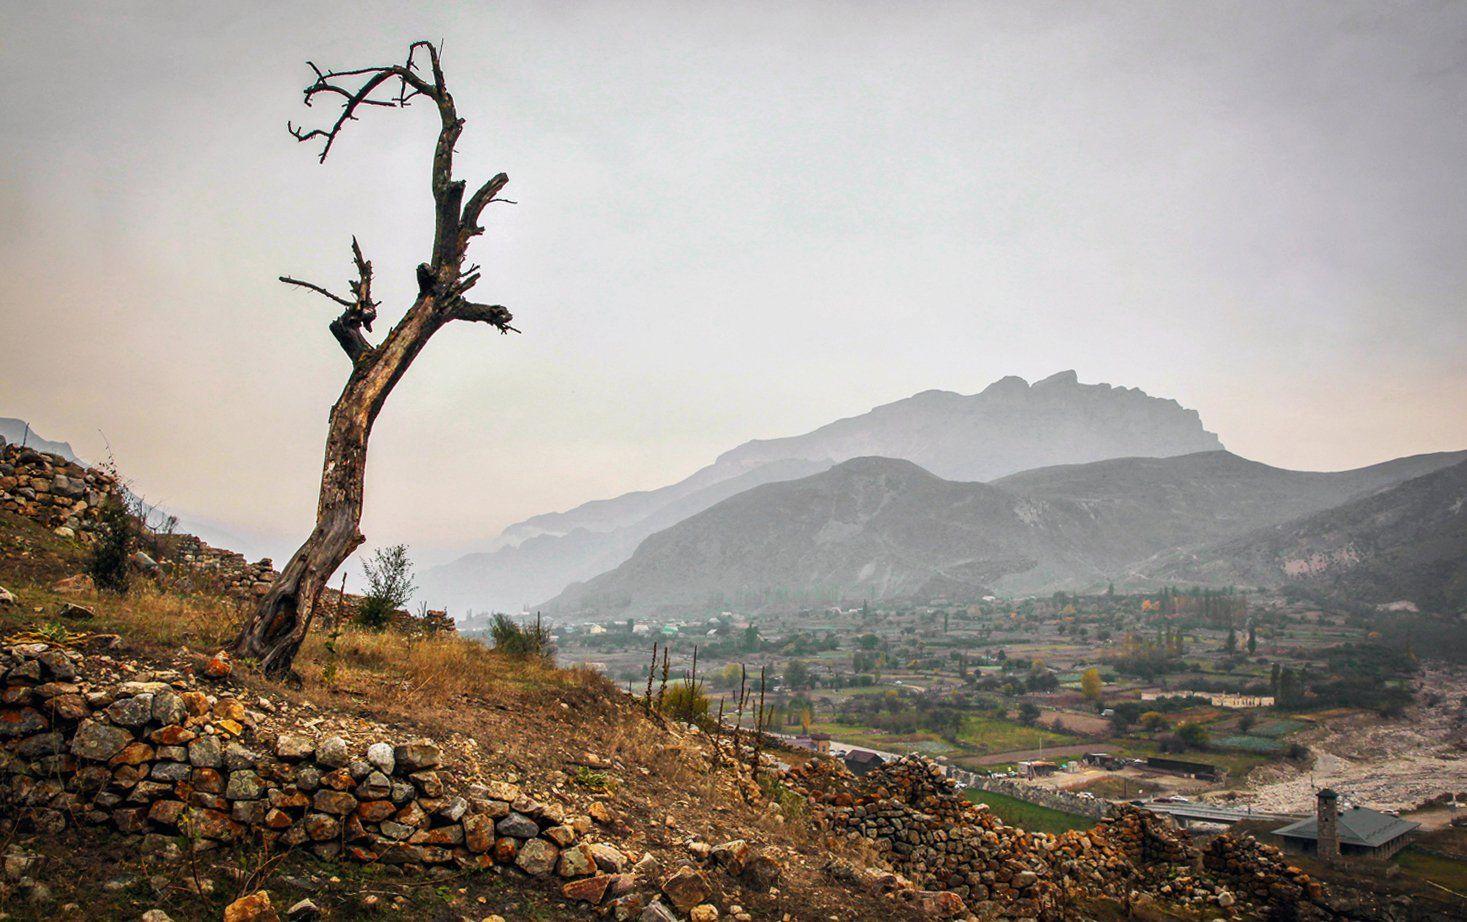 горы,осень,природа,село,туман, Марат Магов